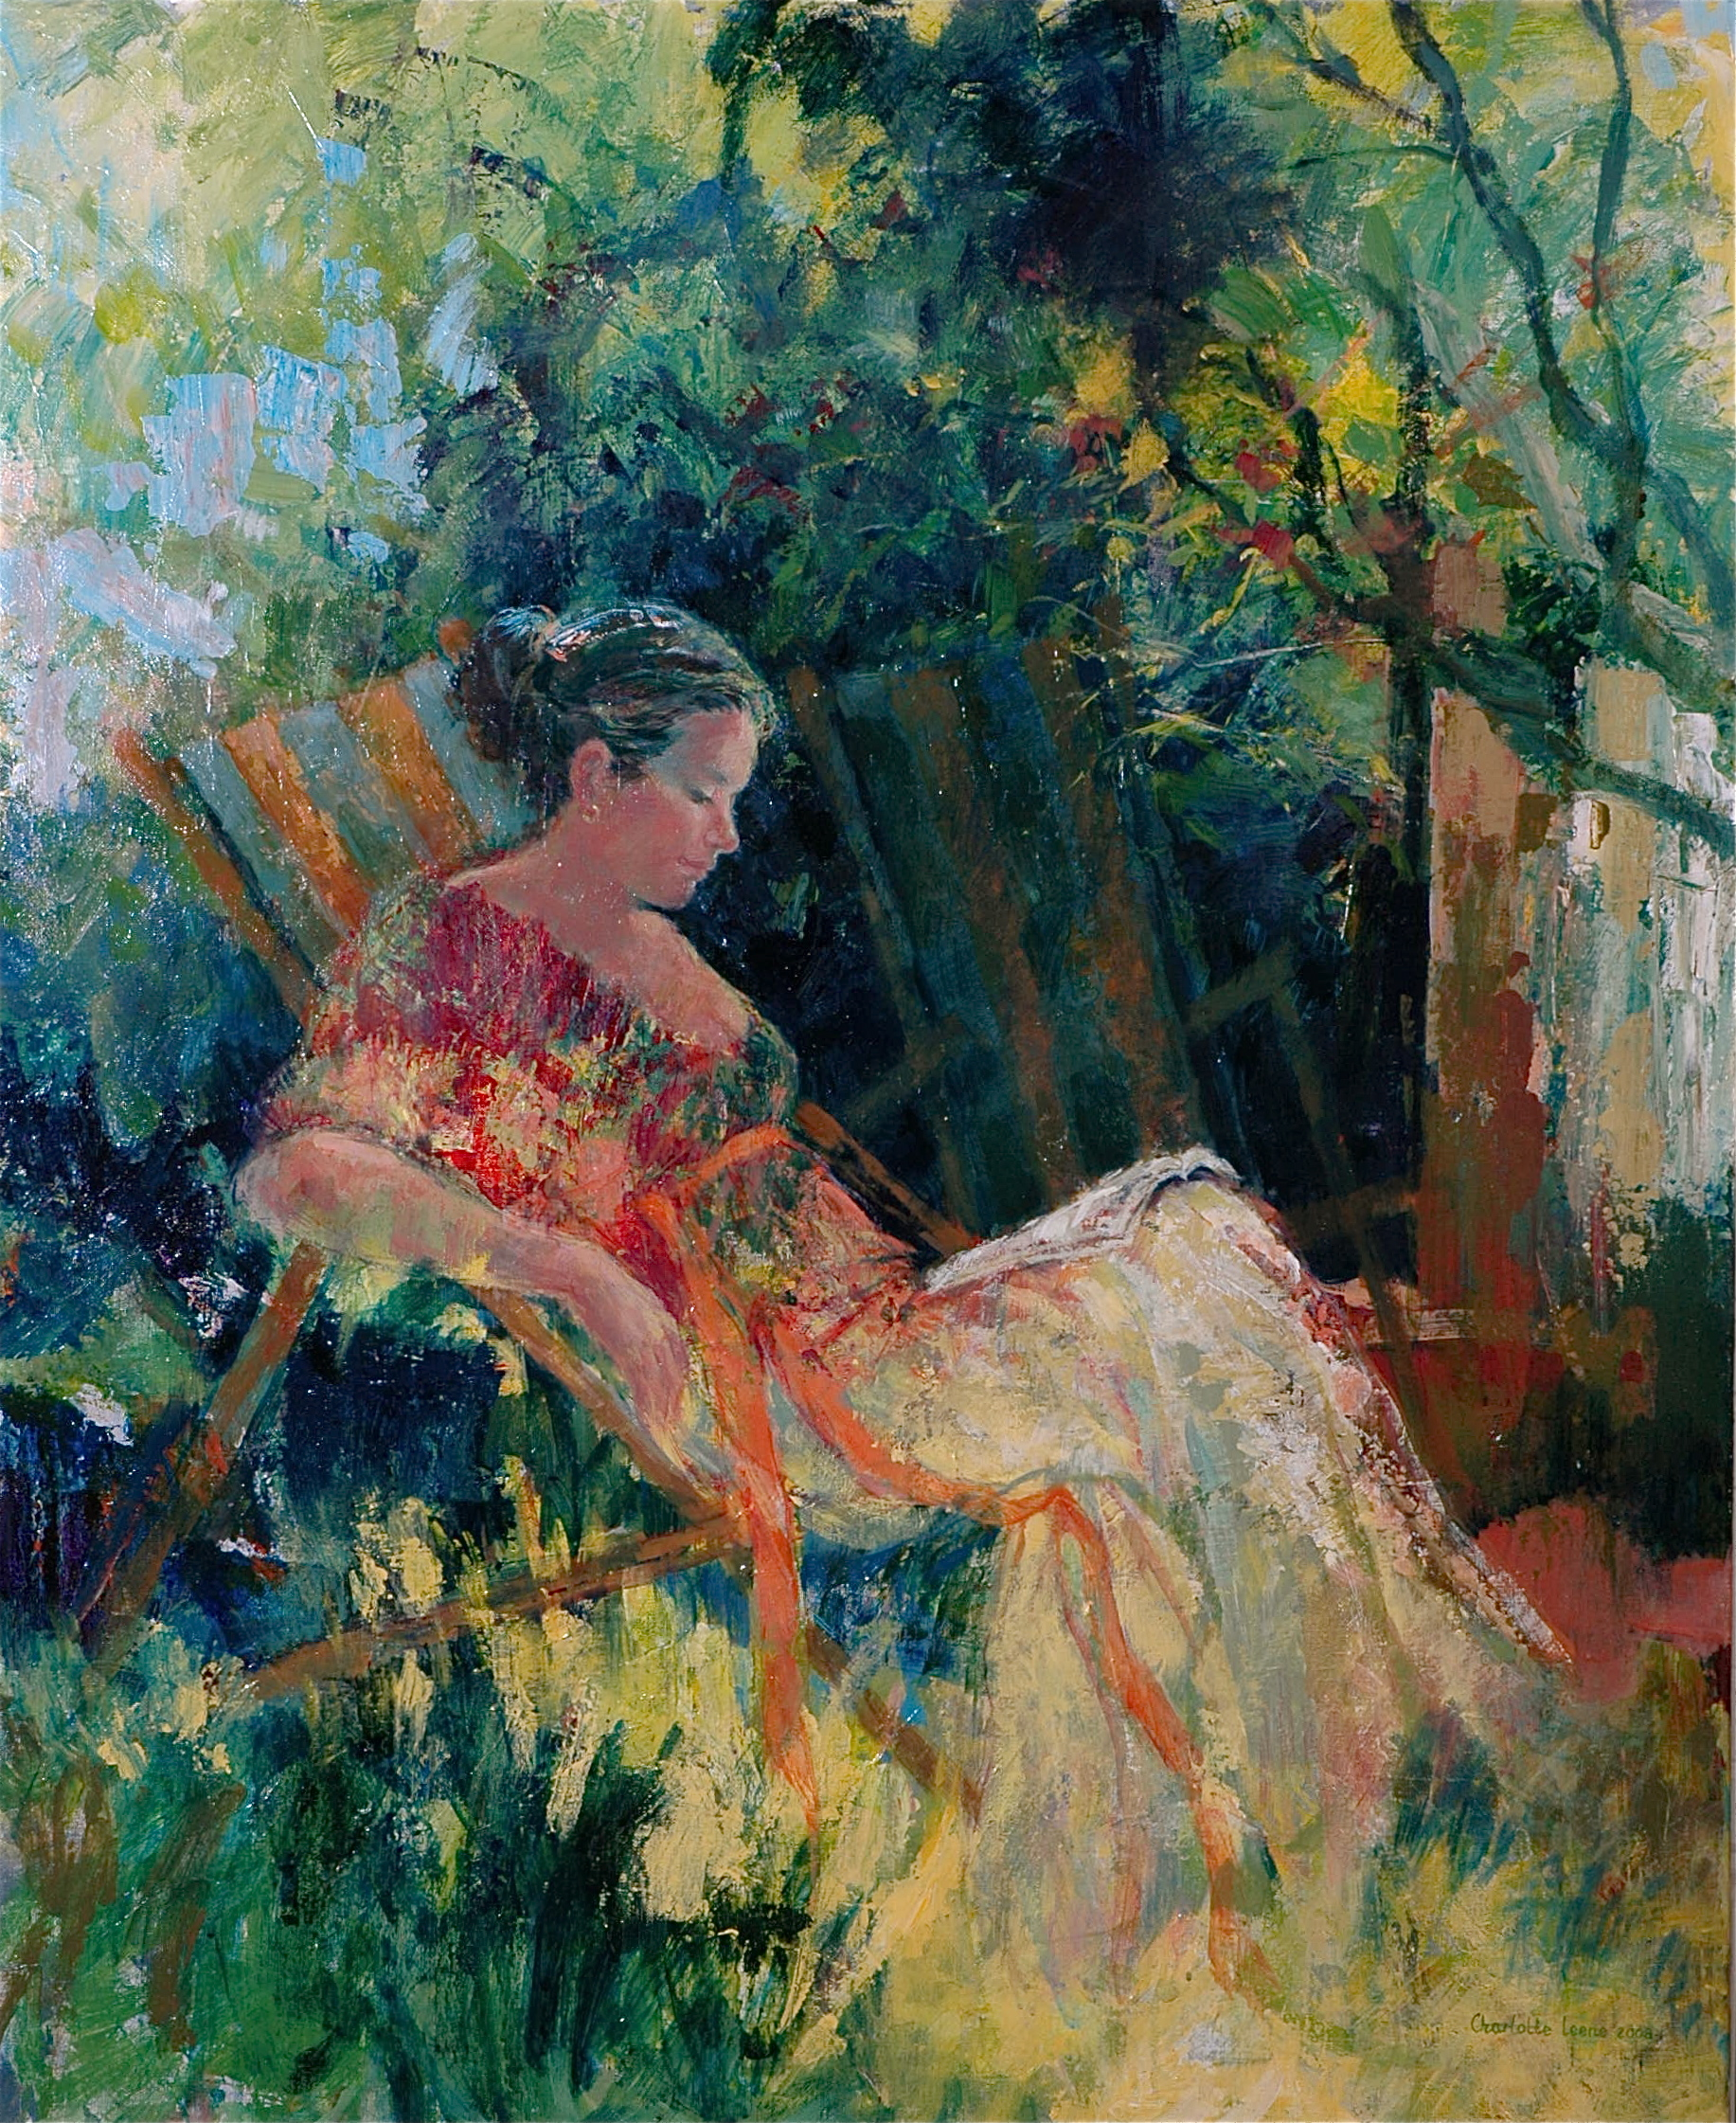 Charlotte Leene